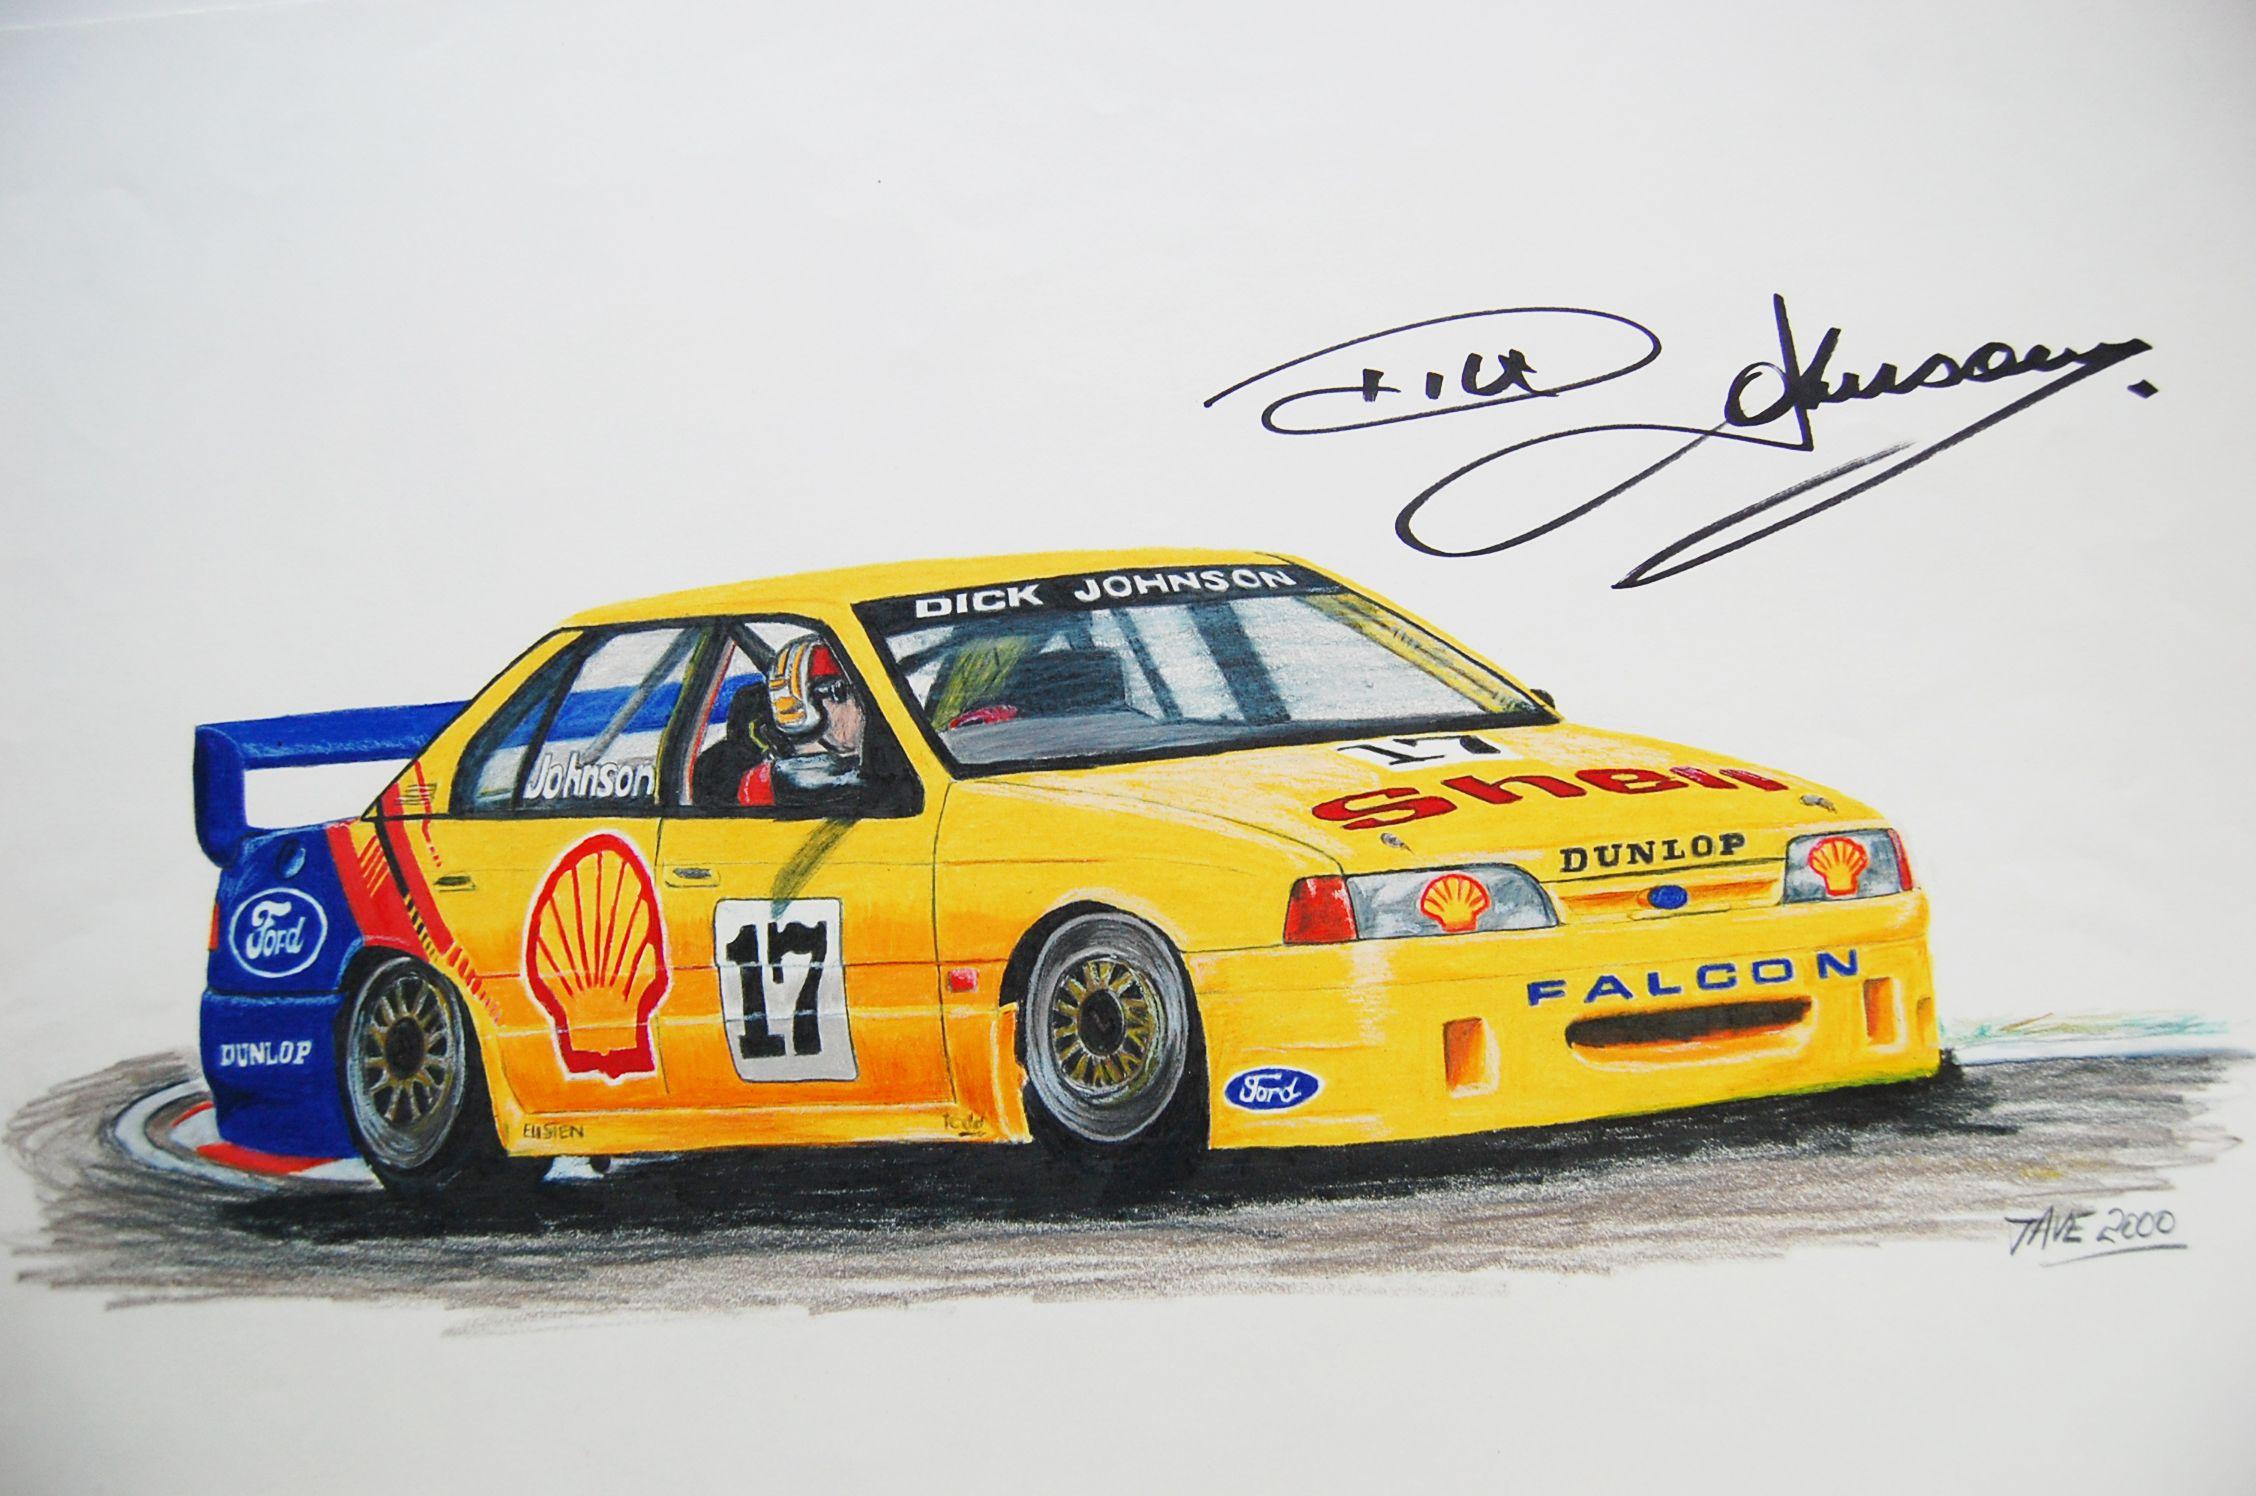 2001 Ford Falcon V8 Supercar: V8 Supercars